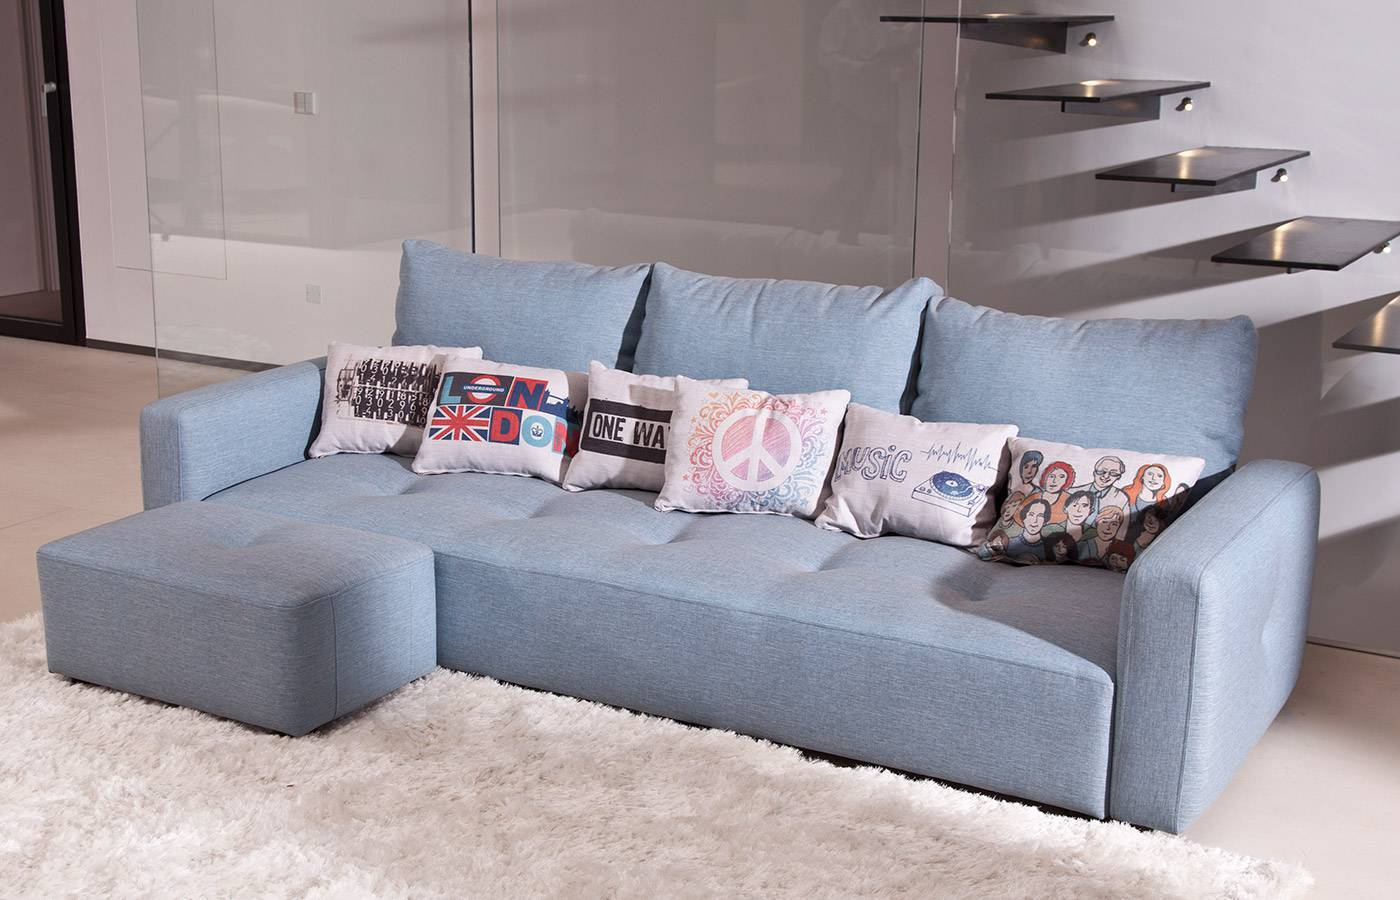 Sof S Online Comprar Sof Online Comprar Sof S Online  # Muebles Liquidacion Manacor